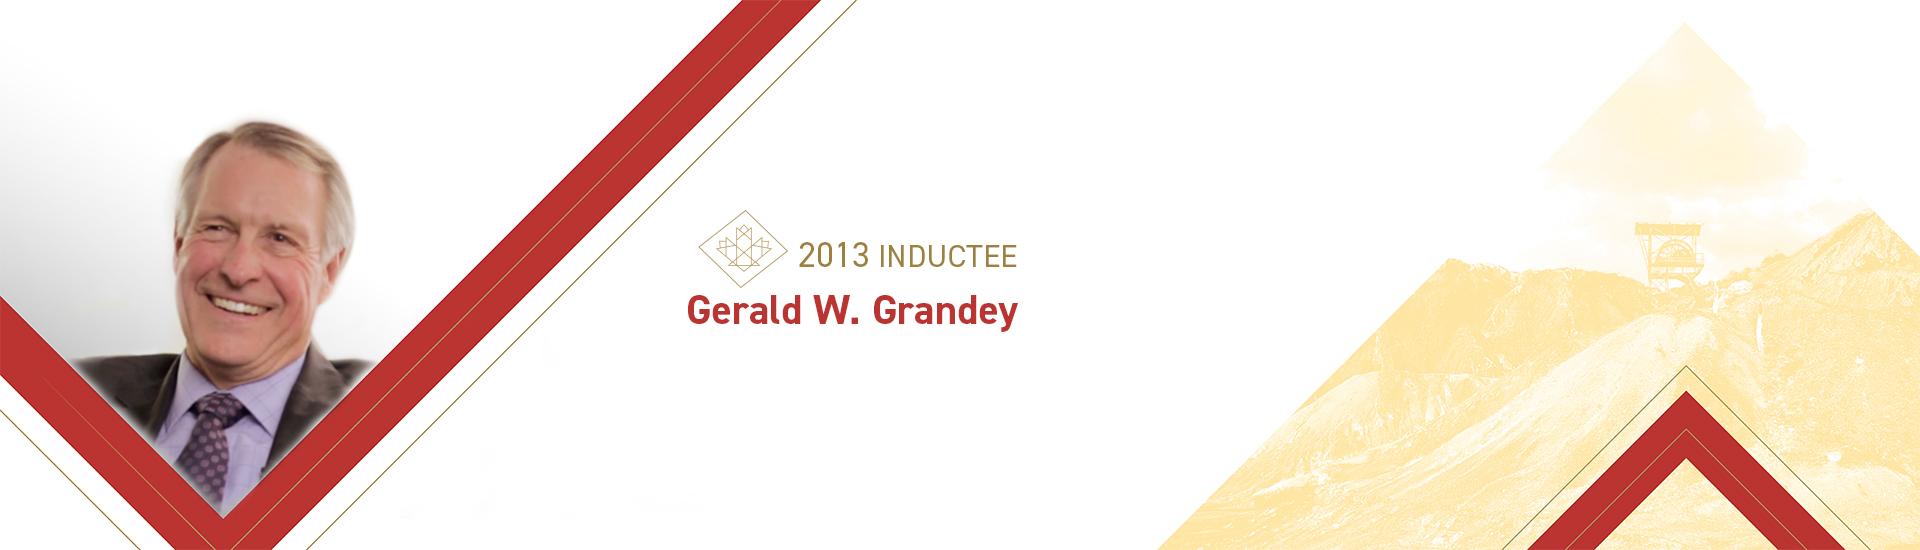 Gerald W. Grandey (b. 1946)